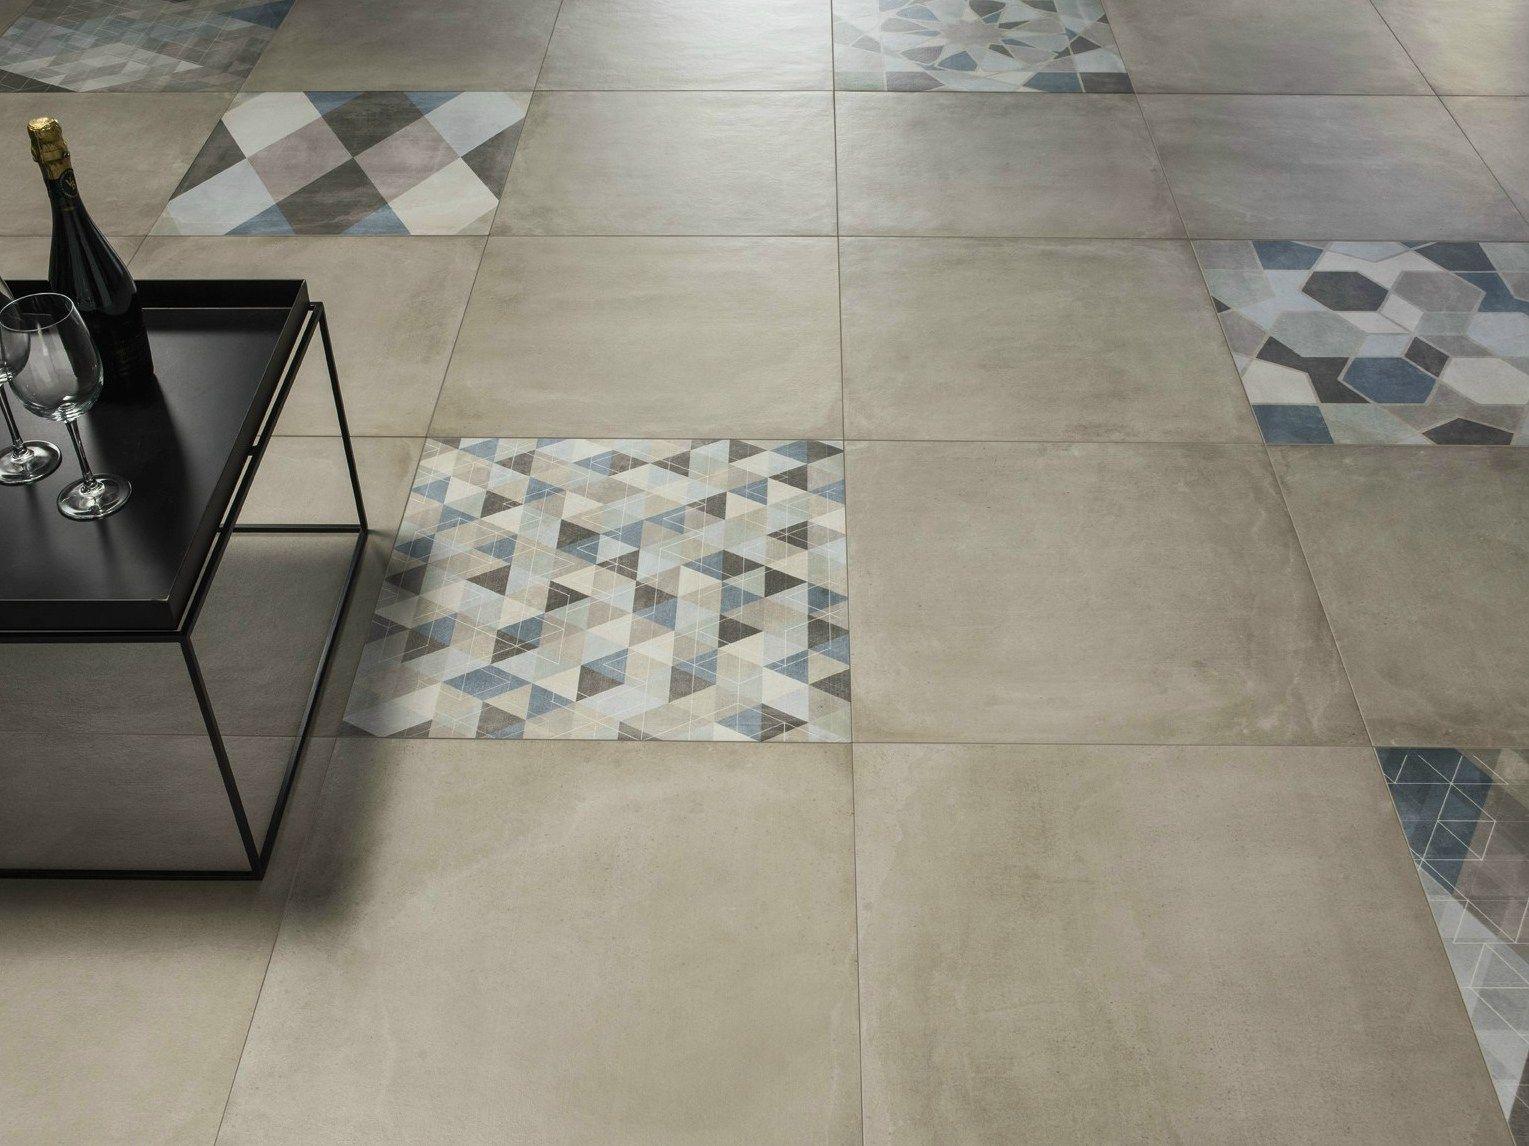 Nice 16 Ceramic Tile Tall 24 Ceramic Tile Rectangular 3D Ceramic Wall Tiles 3X6 Glass Subway Tile Backsplash Old 6 X 12 Glass Subway Tile WhiteAcoustical Ceiling Tiles Prices Caesar Ceramiche | Design | Pinterest